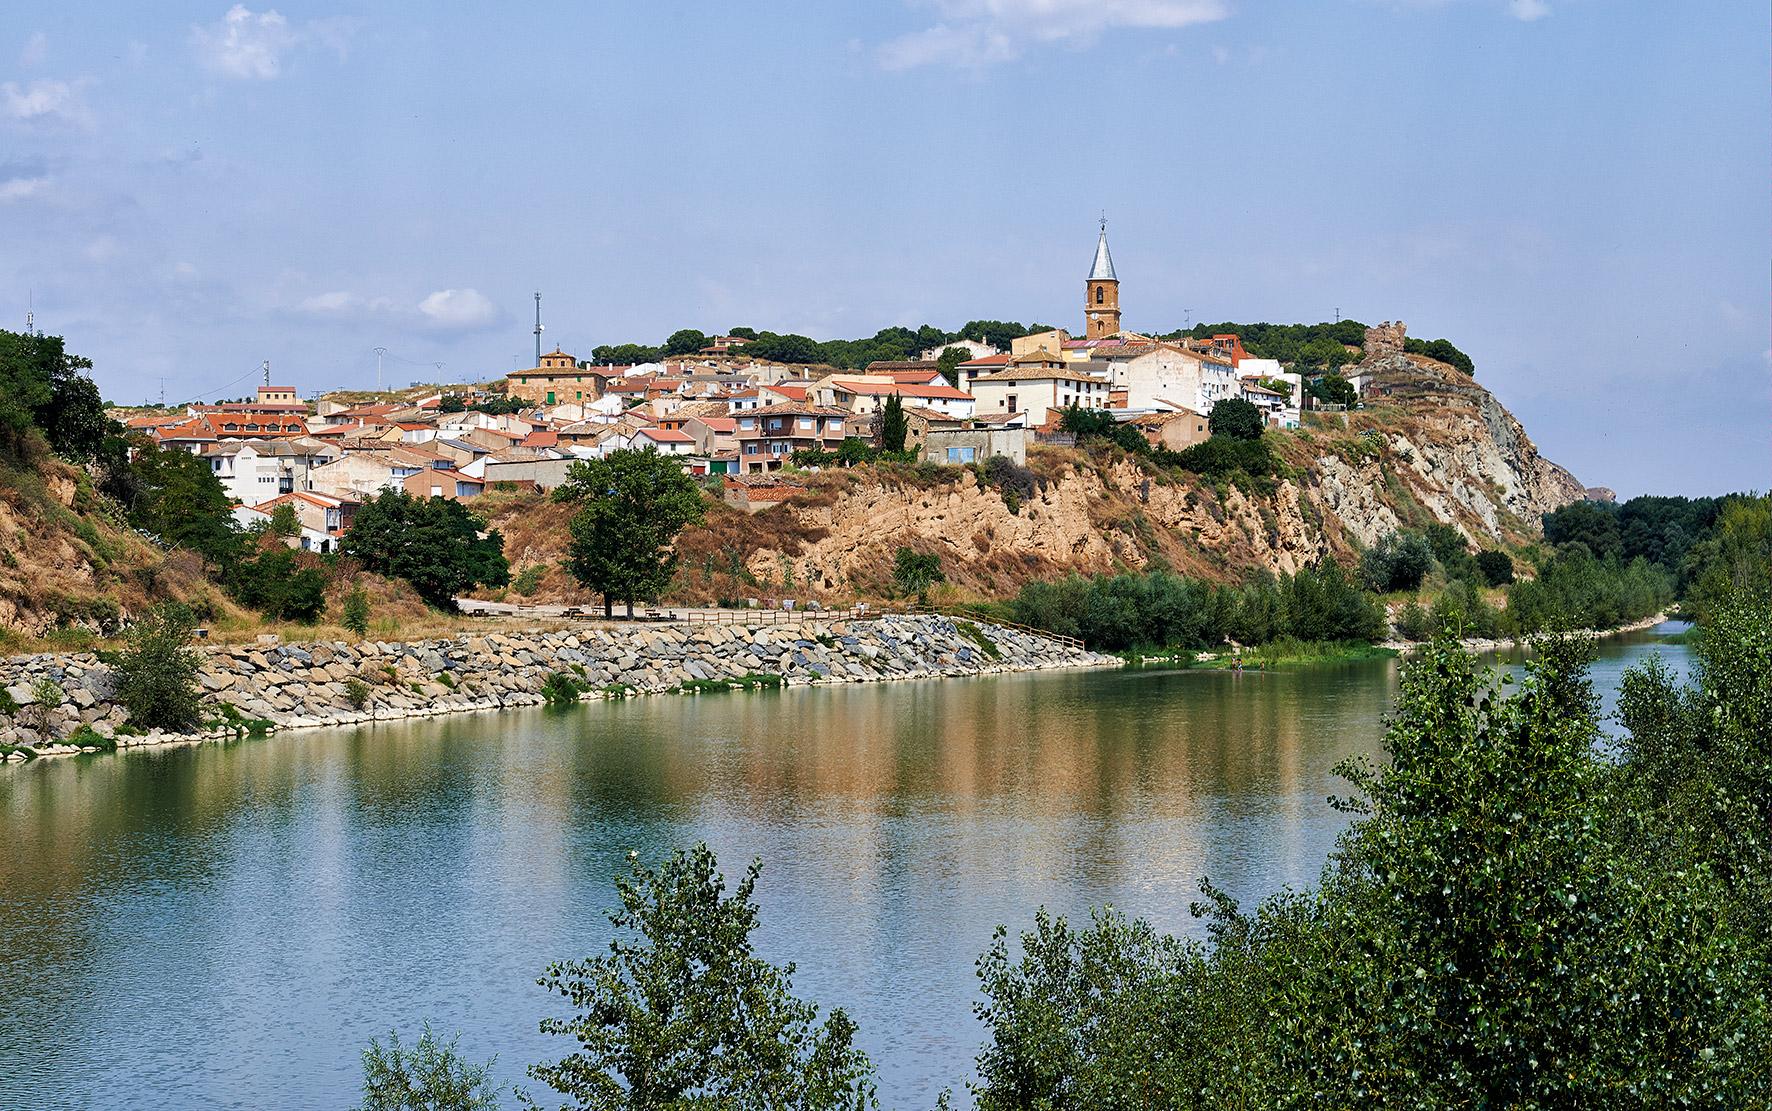 Archivo:Milagro Navarra.jpg - Wikipedia, la enciclopedia libre